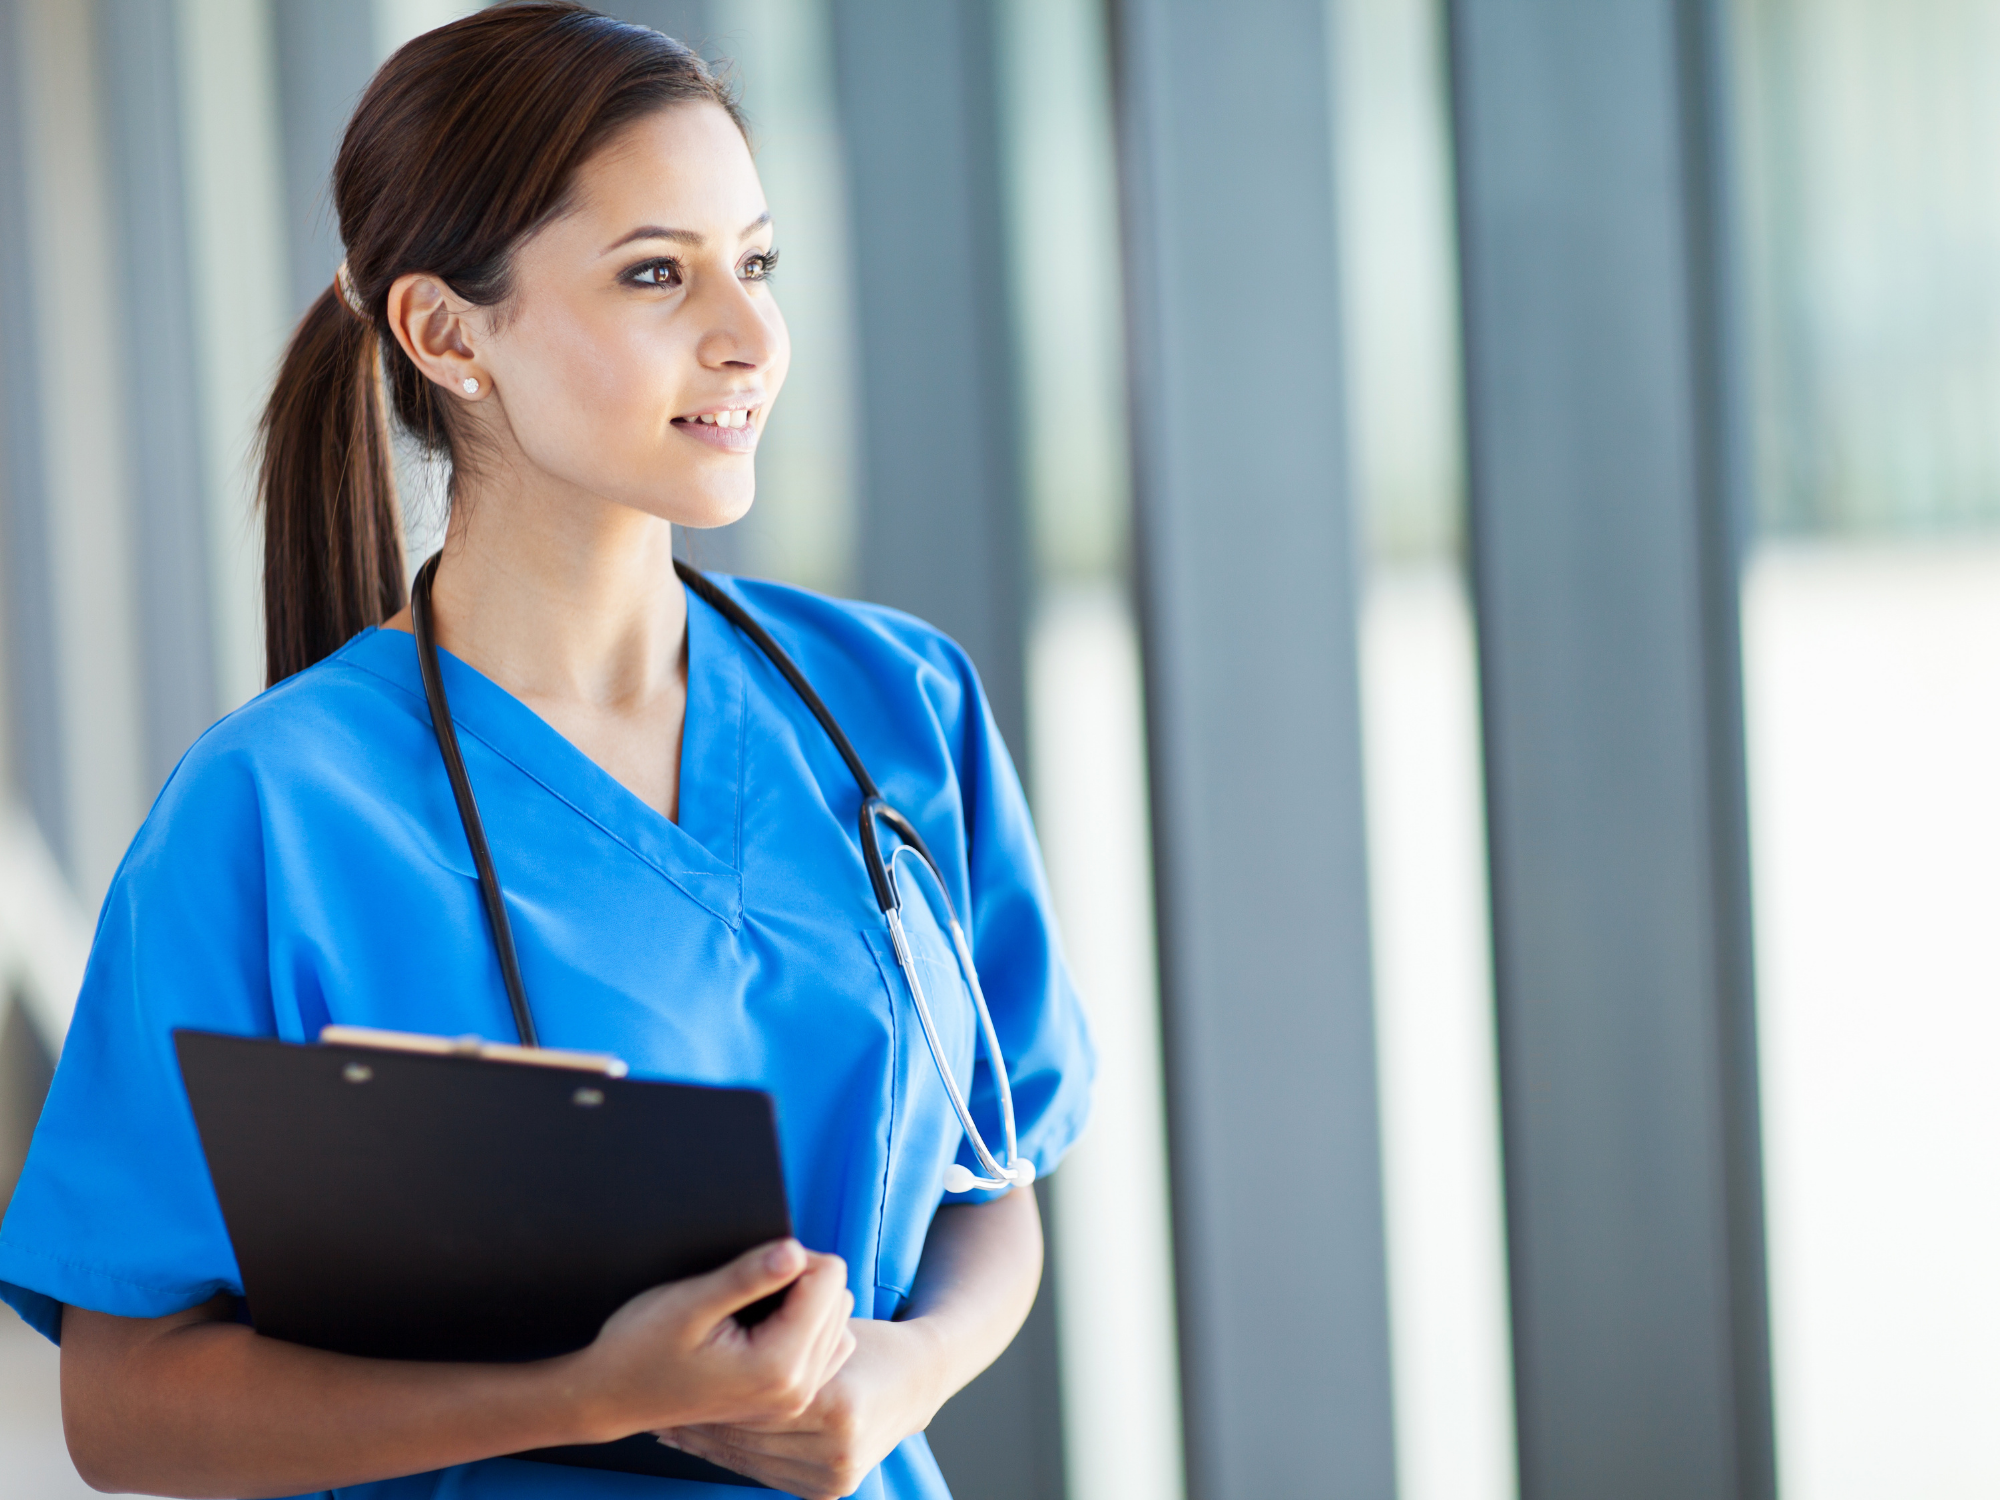 Nurse with a clipboard